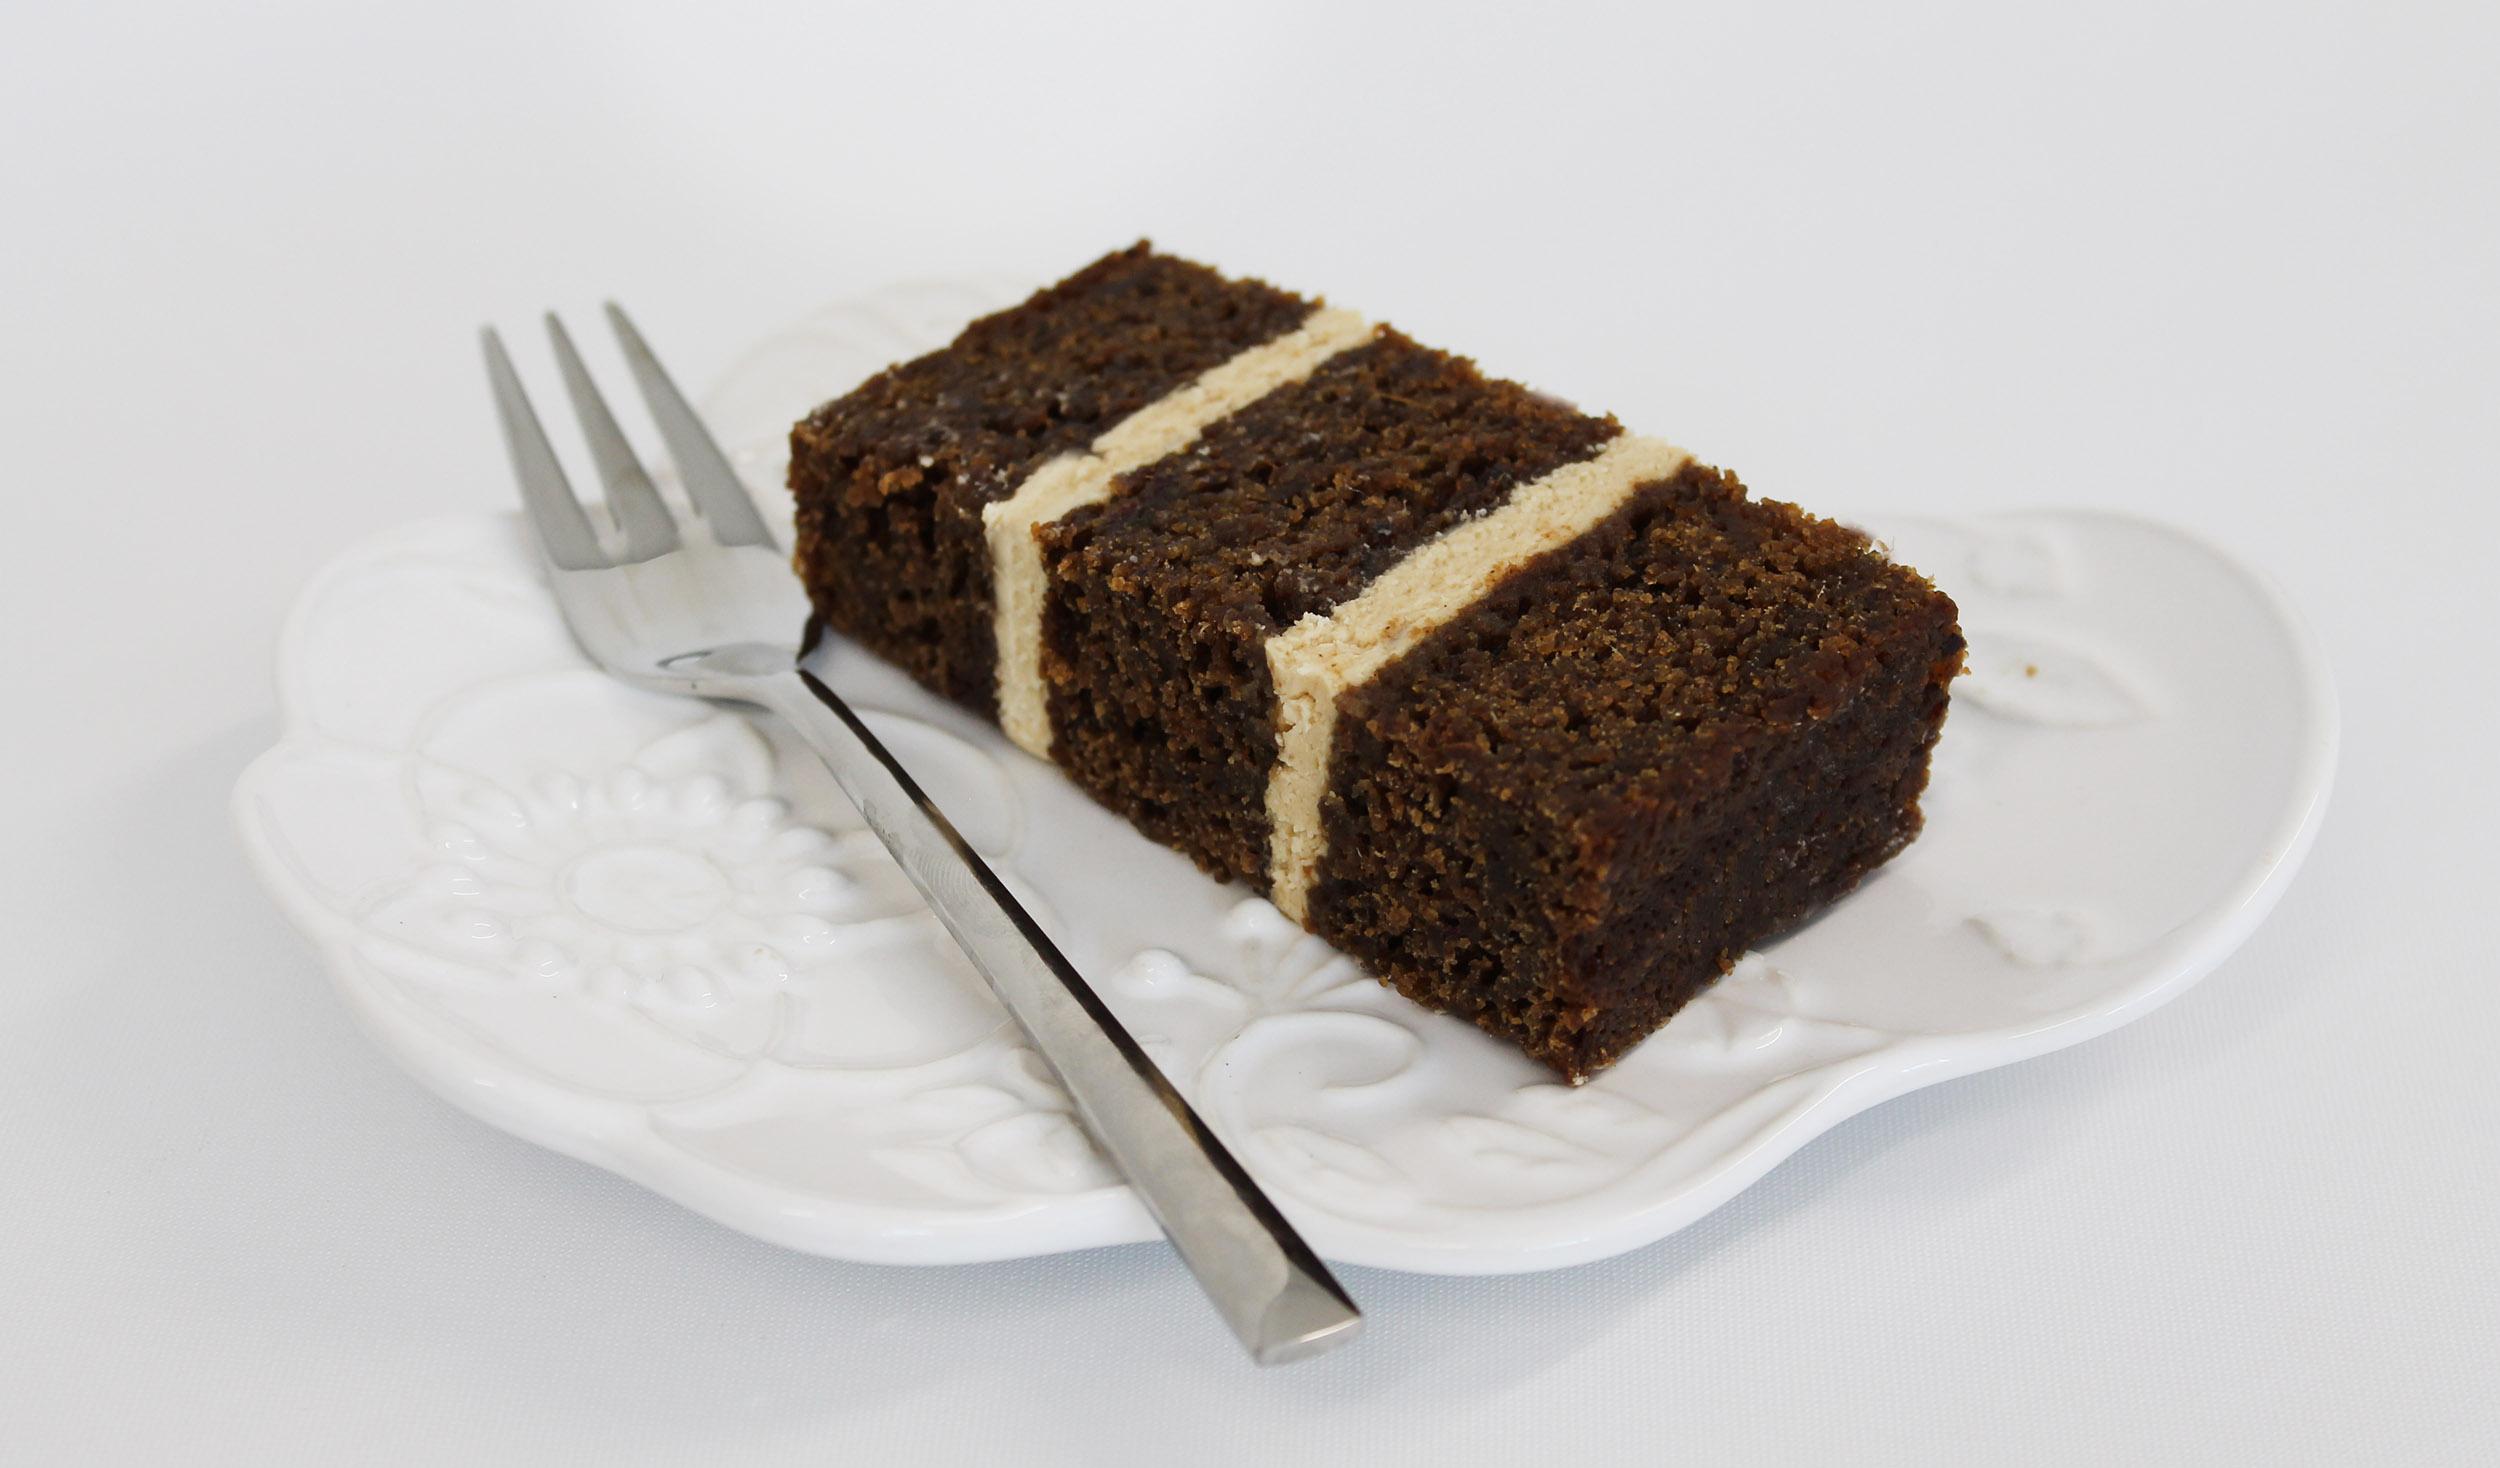 cake_slice.jpg